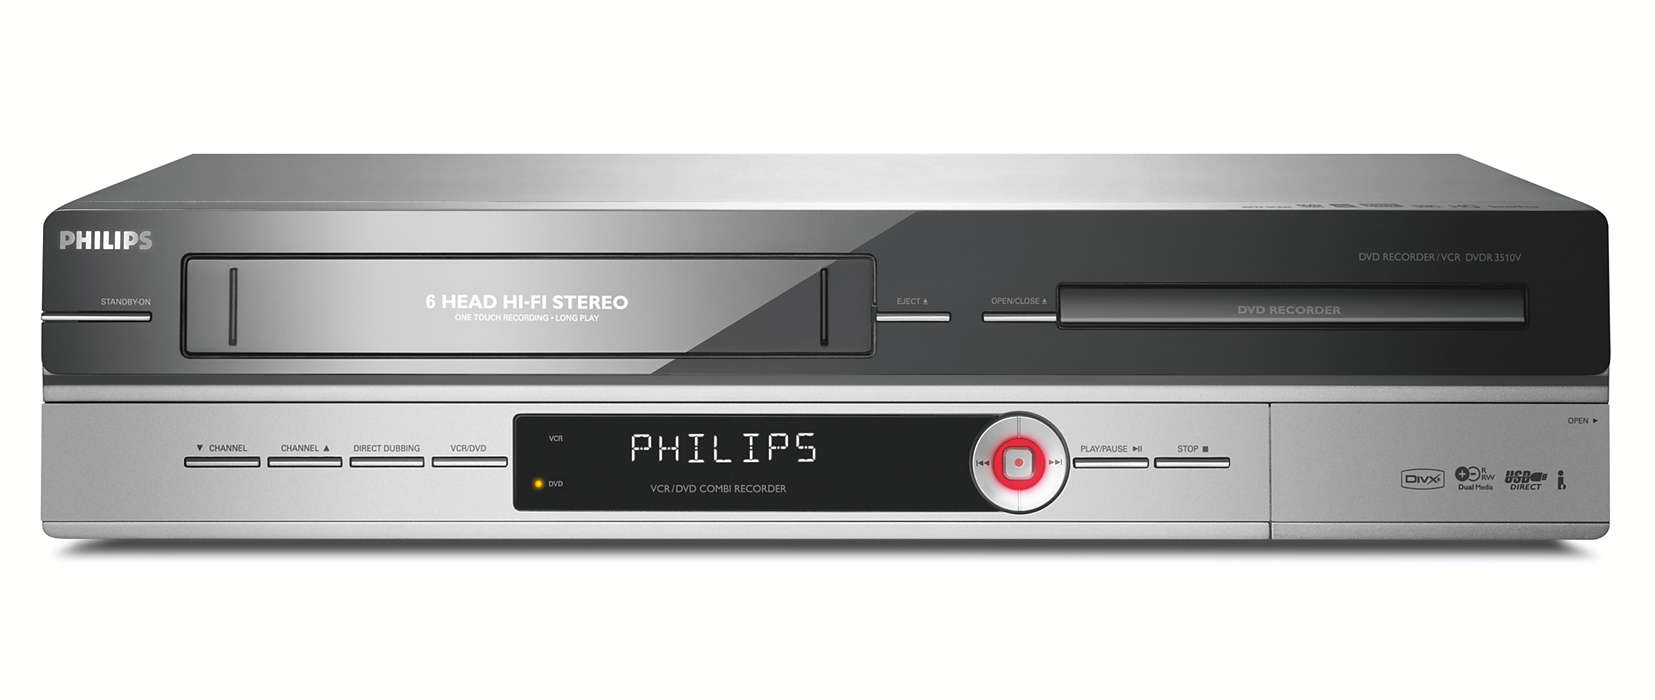 Convierte tus cintas VHS en DVD